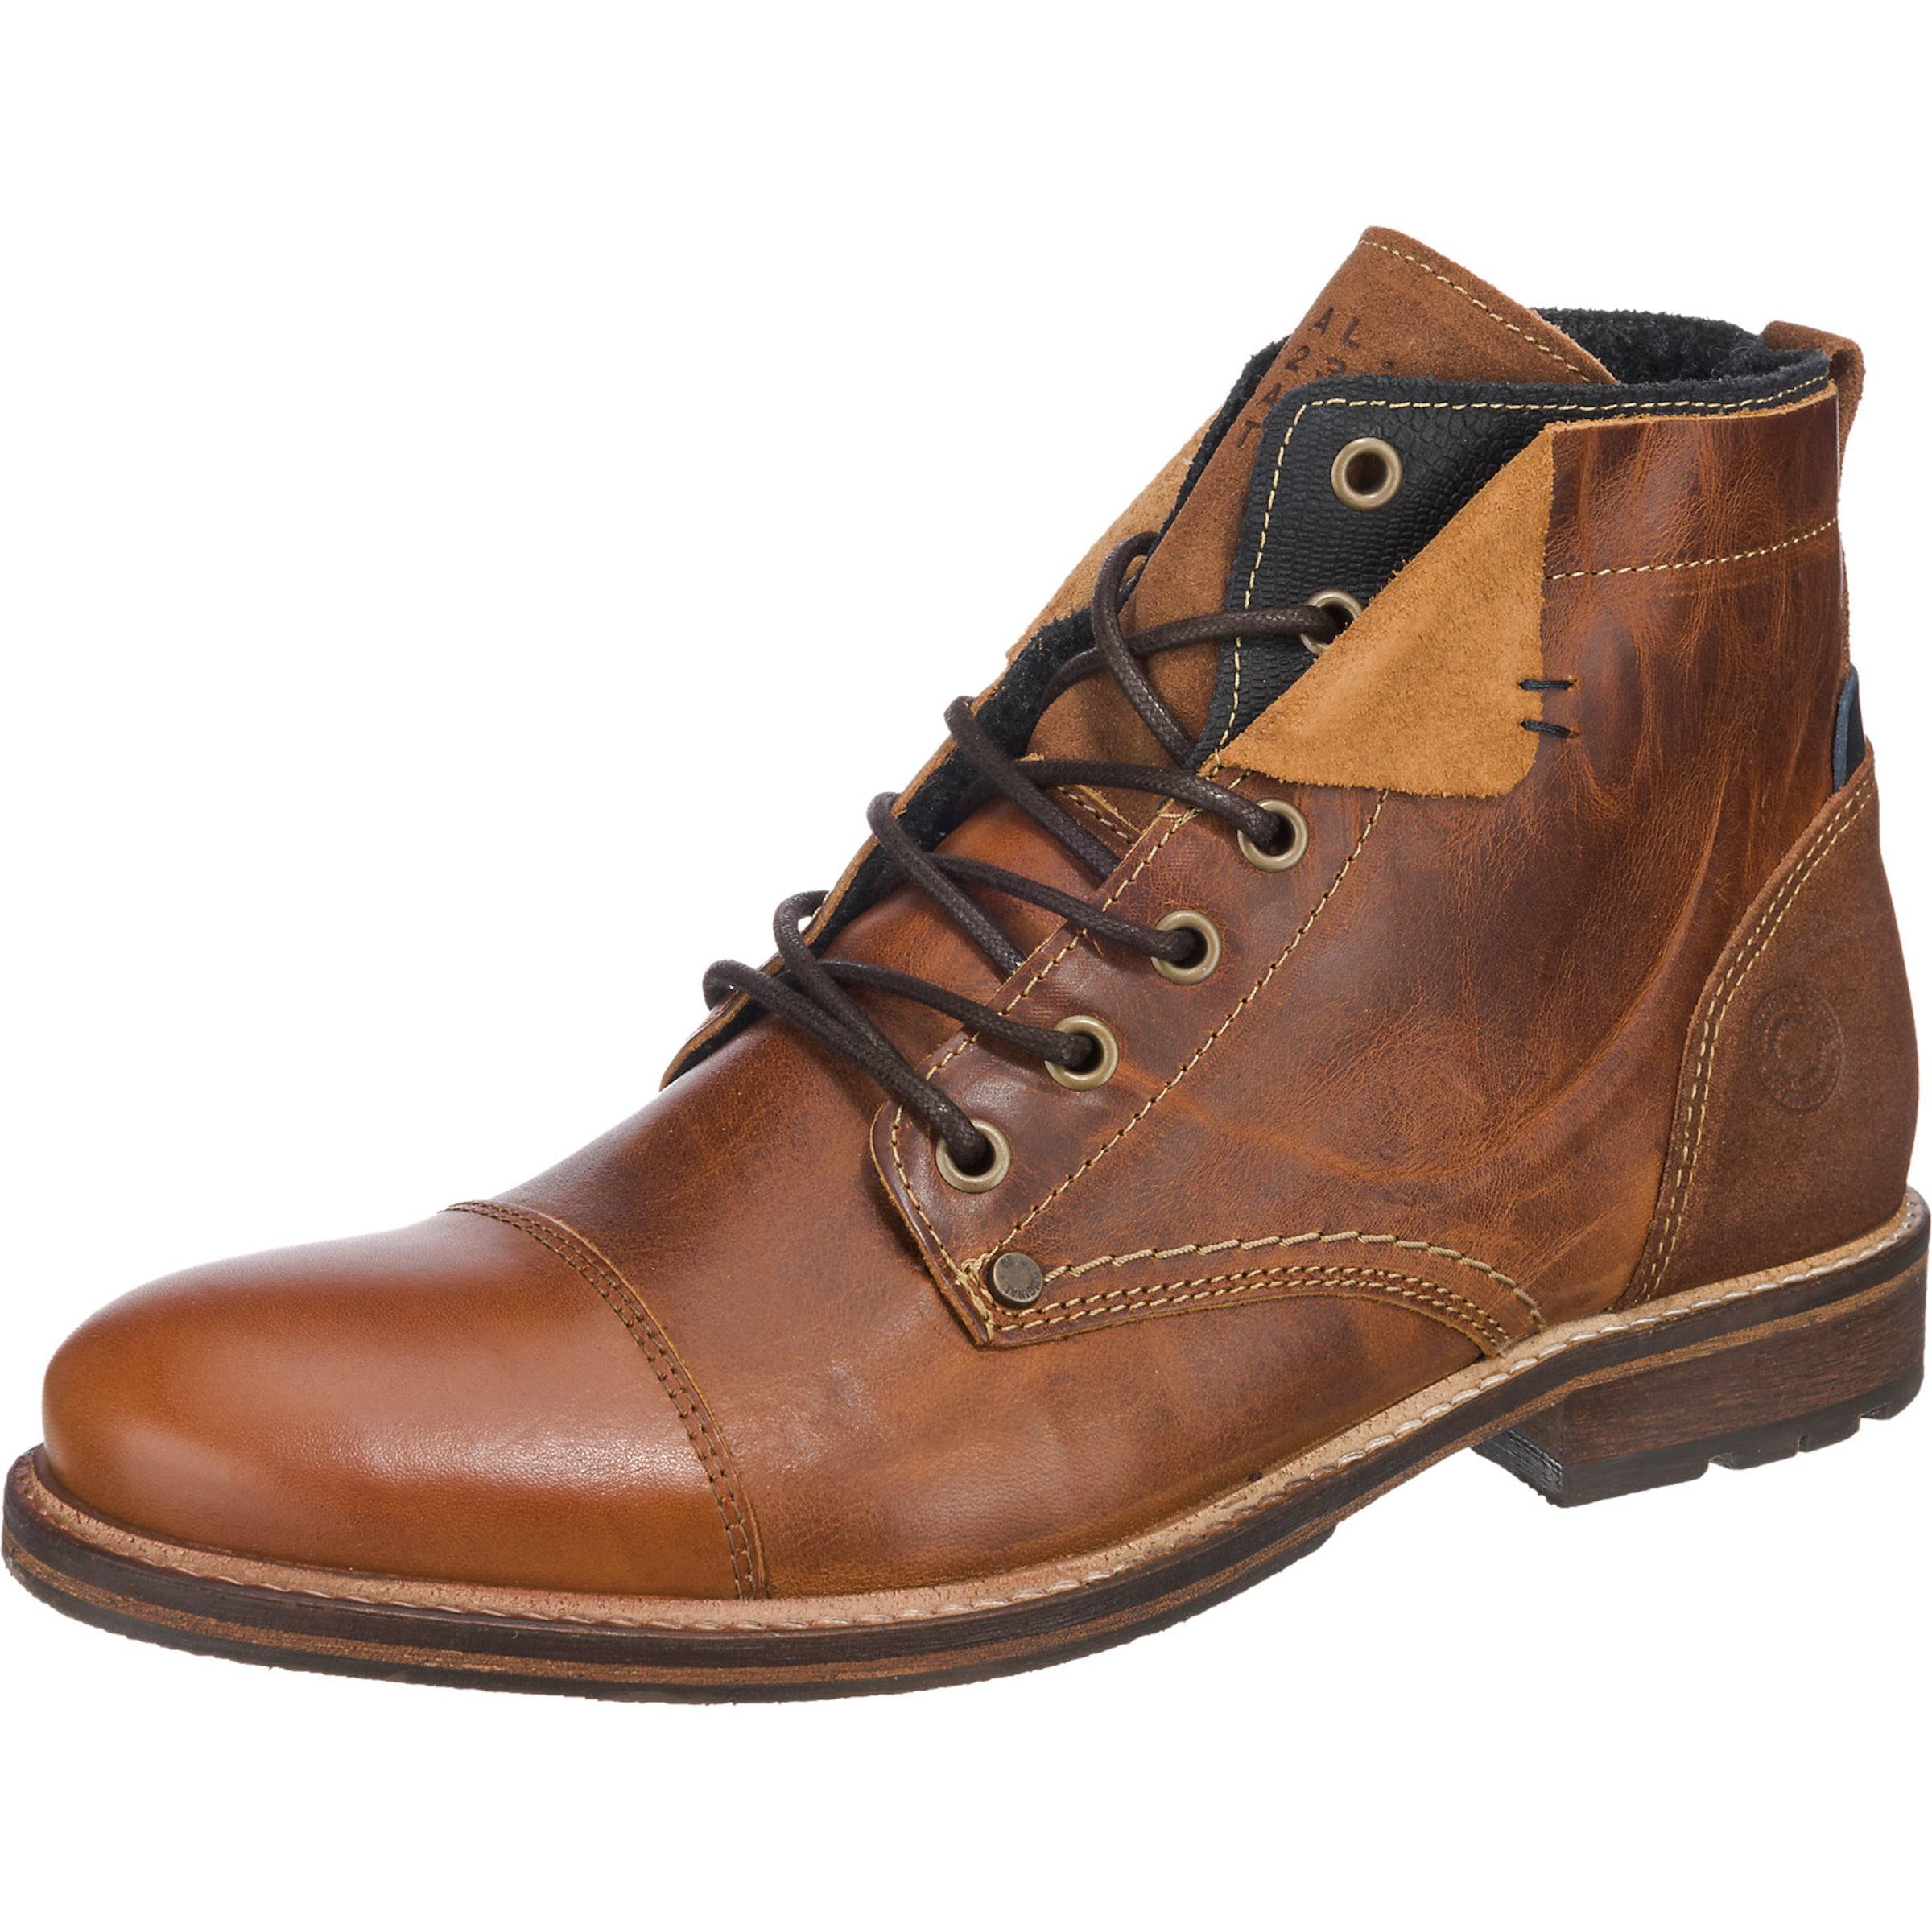 Haltbare Mode billige Schuhe BULLBOXER | Stiefeletten Schuhe Gut Gut Gut getragene Schuhe 8fec49